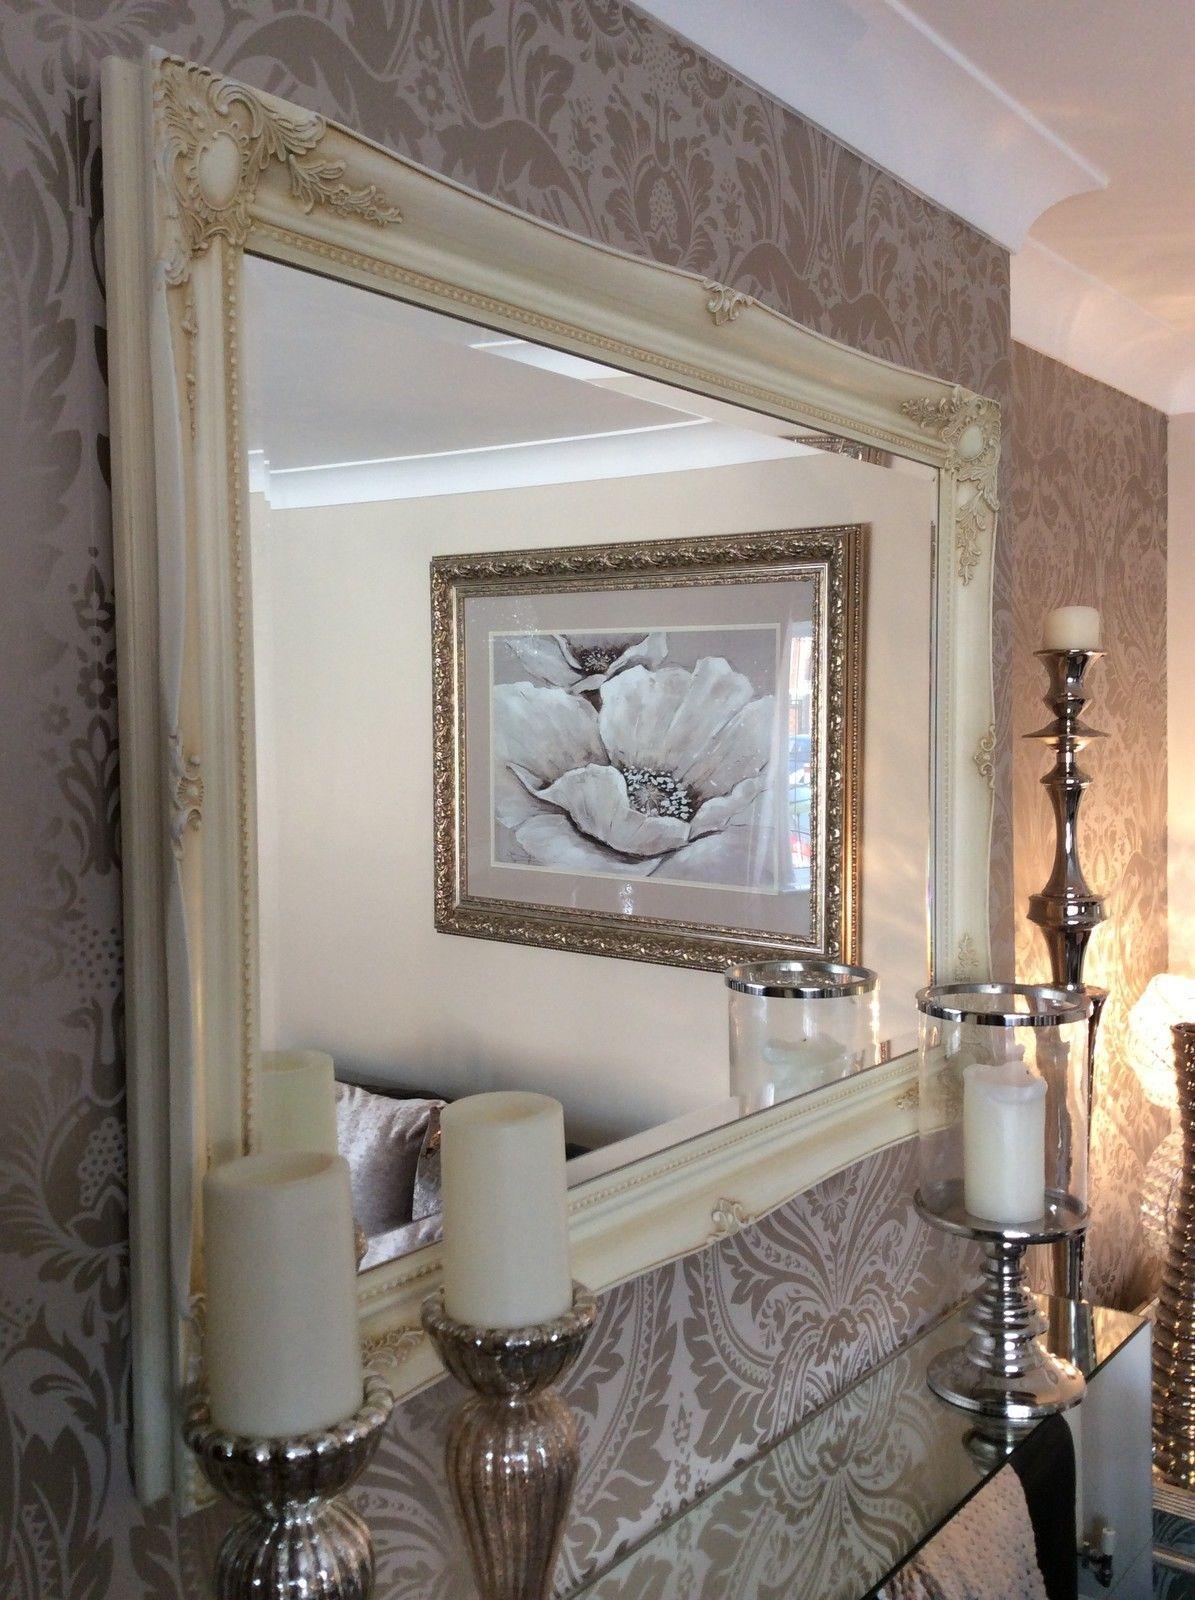 Cream Ivory Swept Shab Chic Mirror 42inch X 30inch 107cm X Inside Large Shabby Chic Mirror (View 5 of 15)